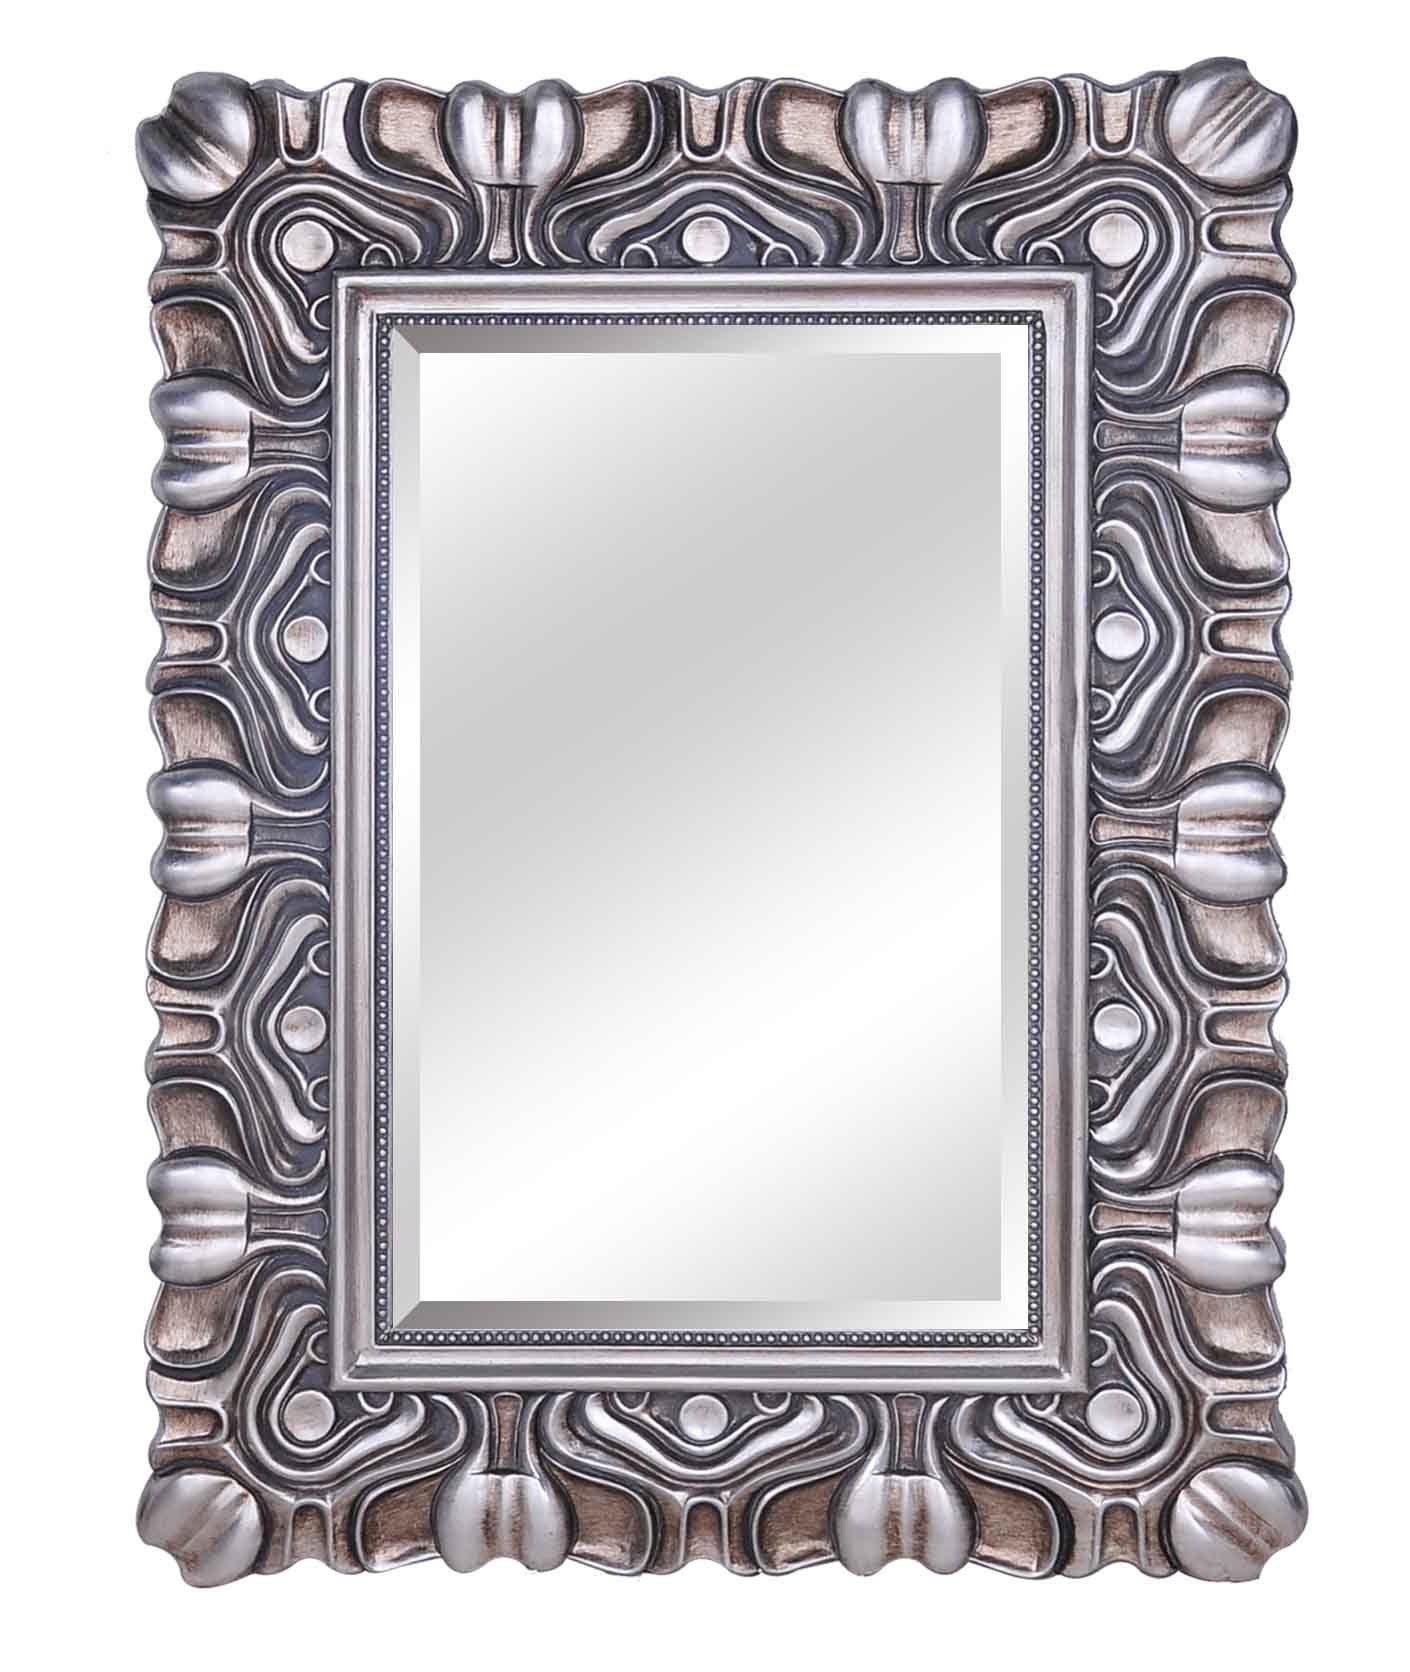 saln de belleza espejo moderno enmarcado espejo elegante espejo de pared